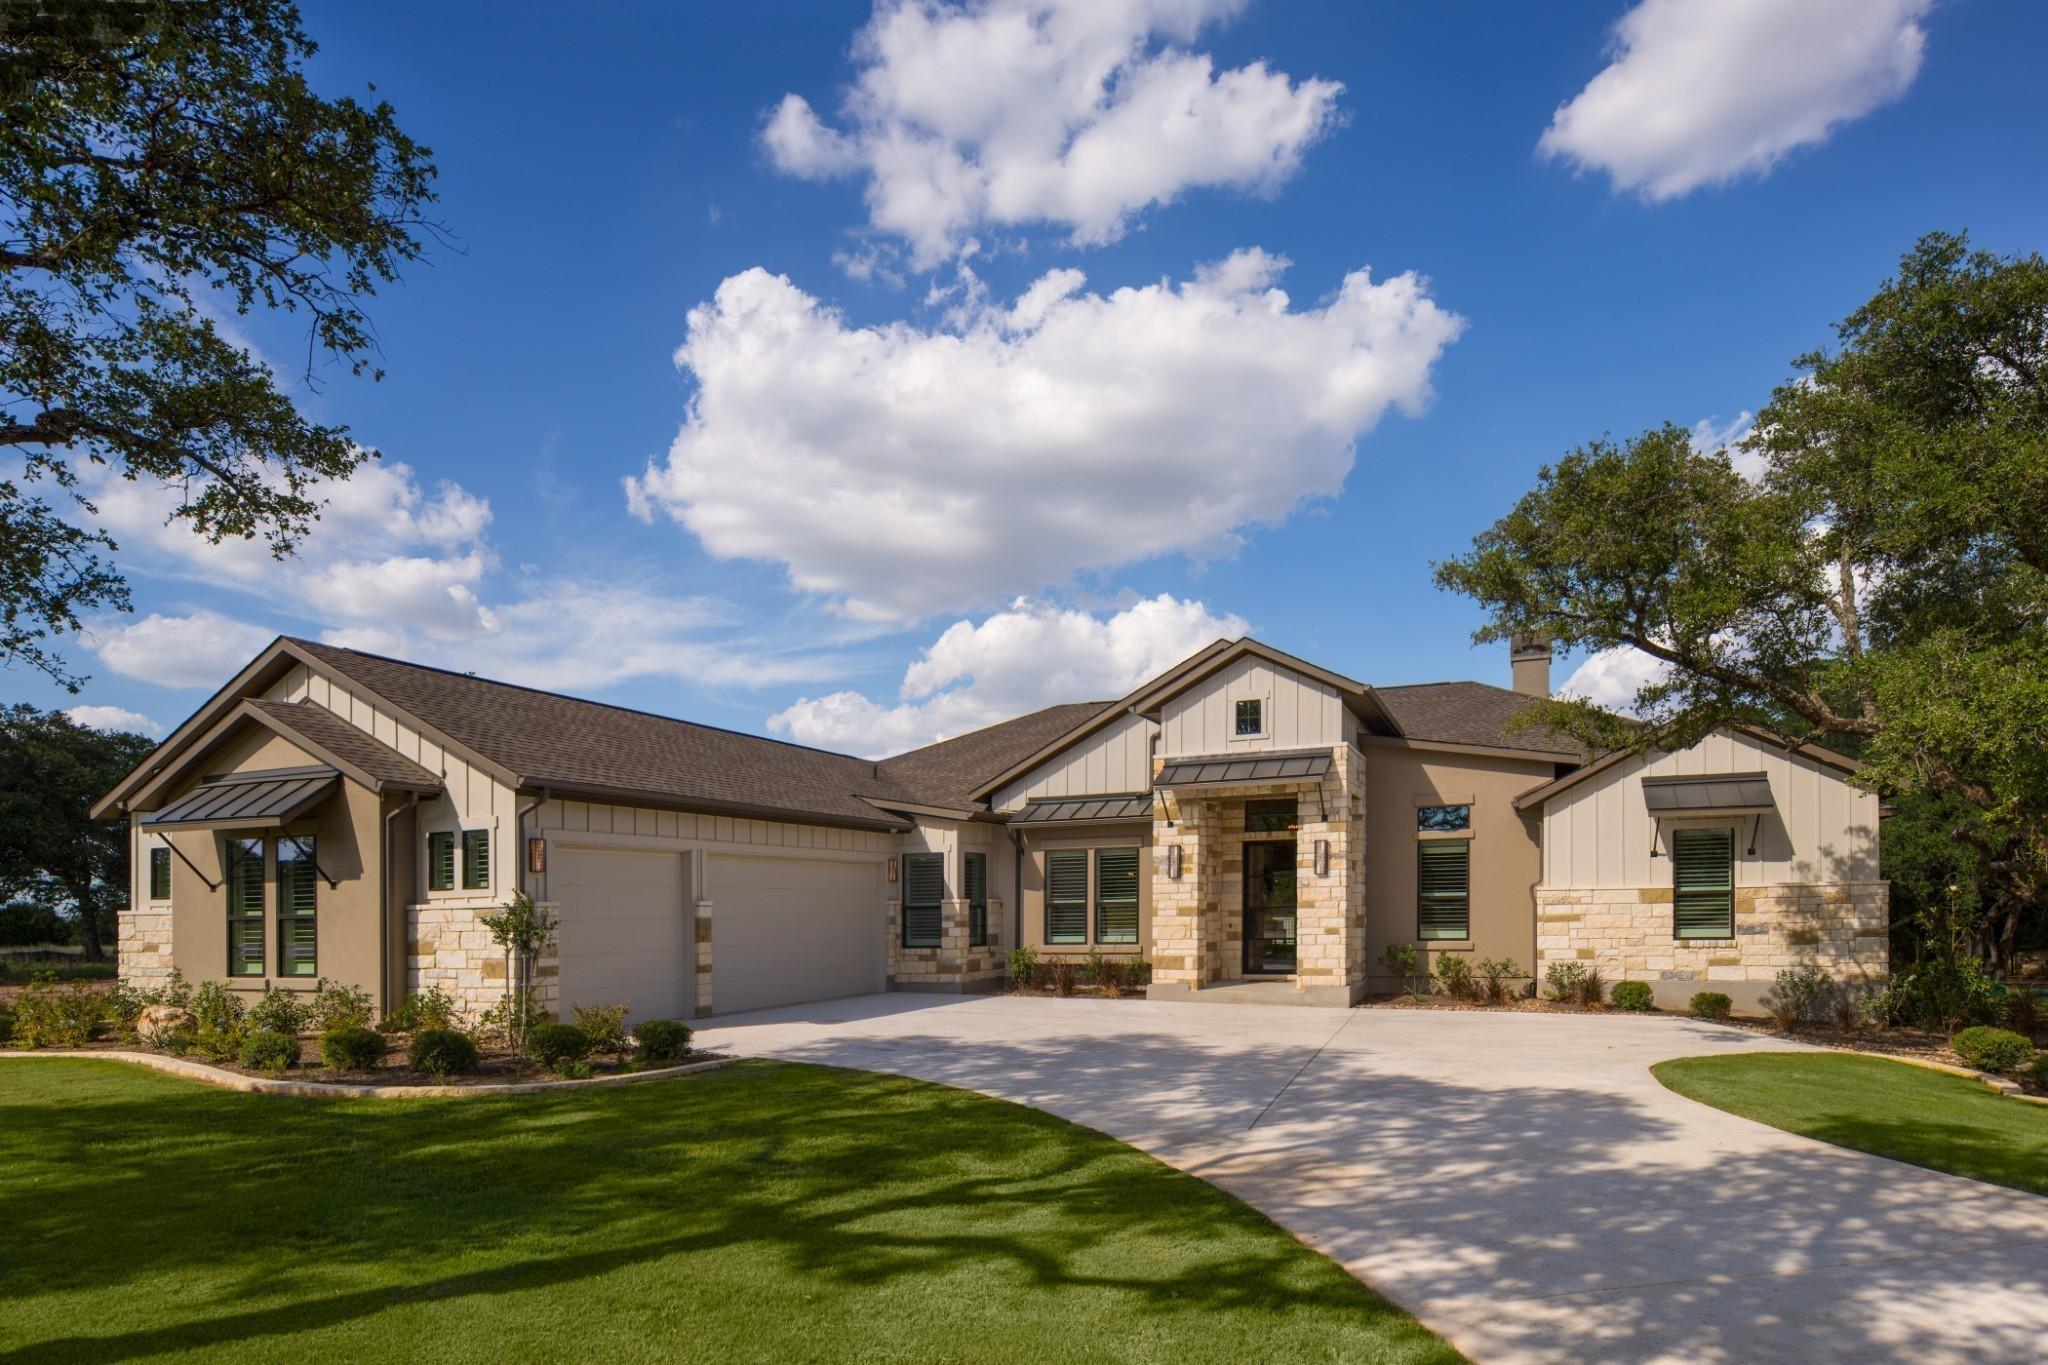 6015 Lookaway Cir Property Photo - Franklin, TN real estate listing